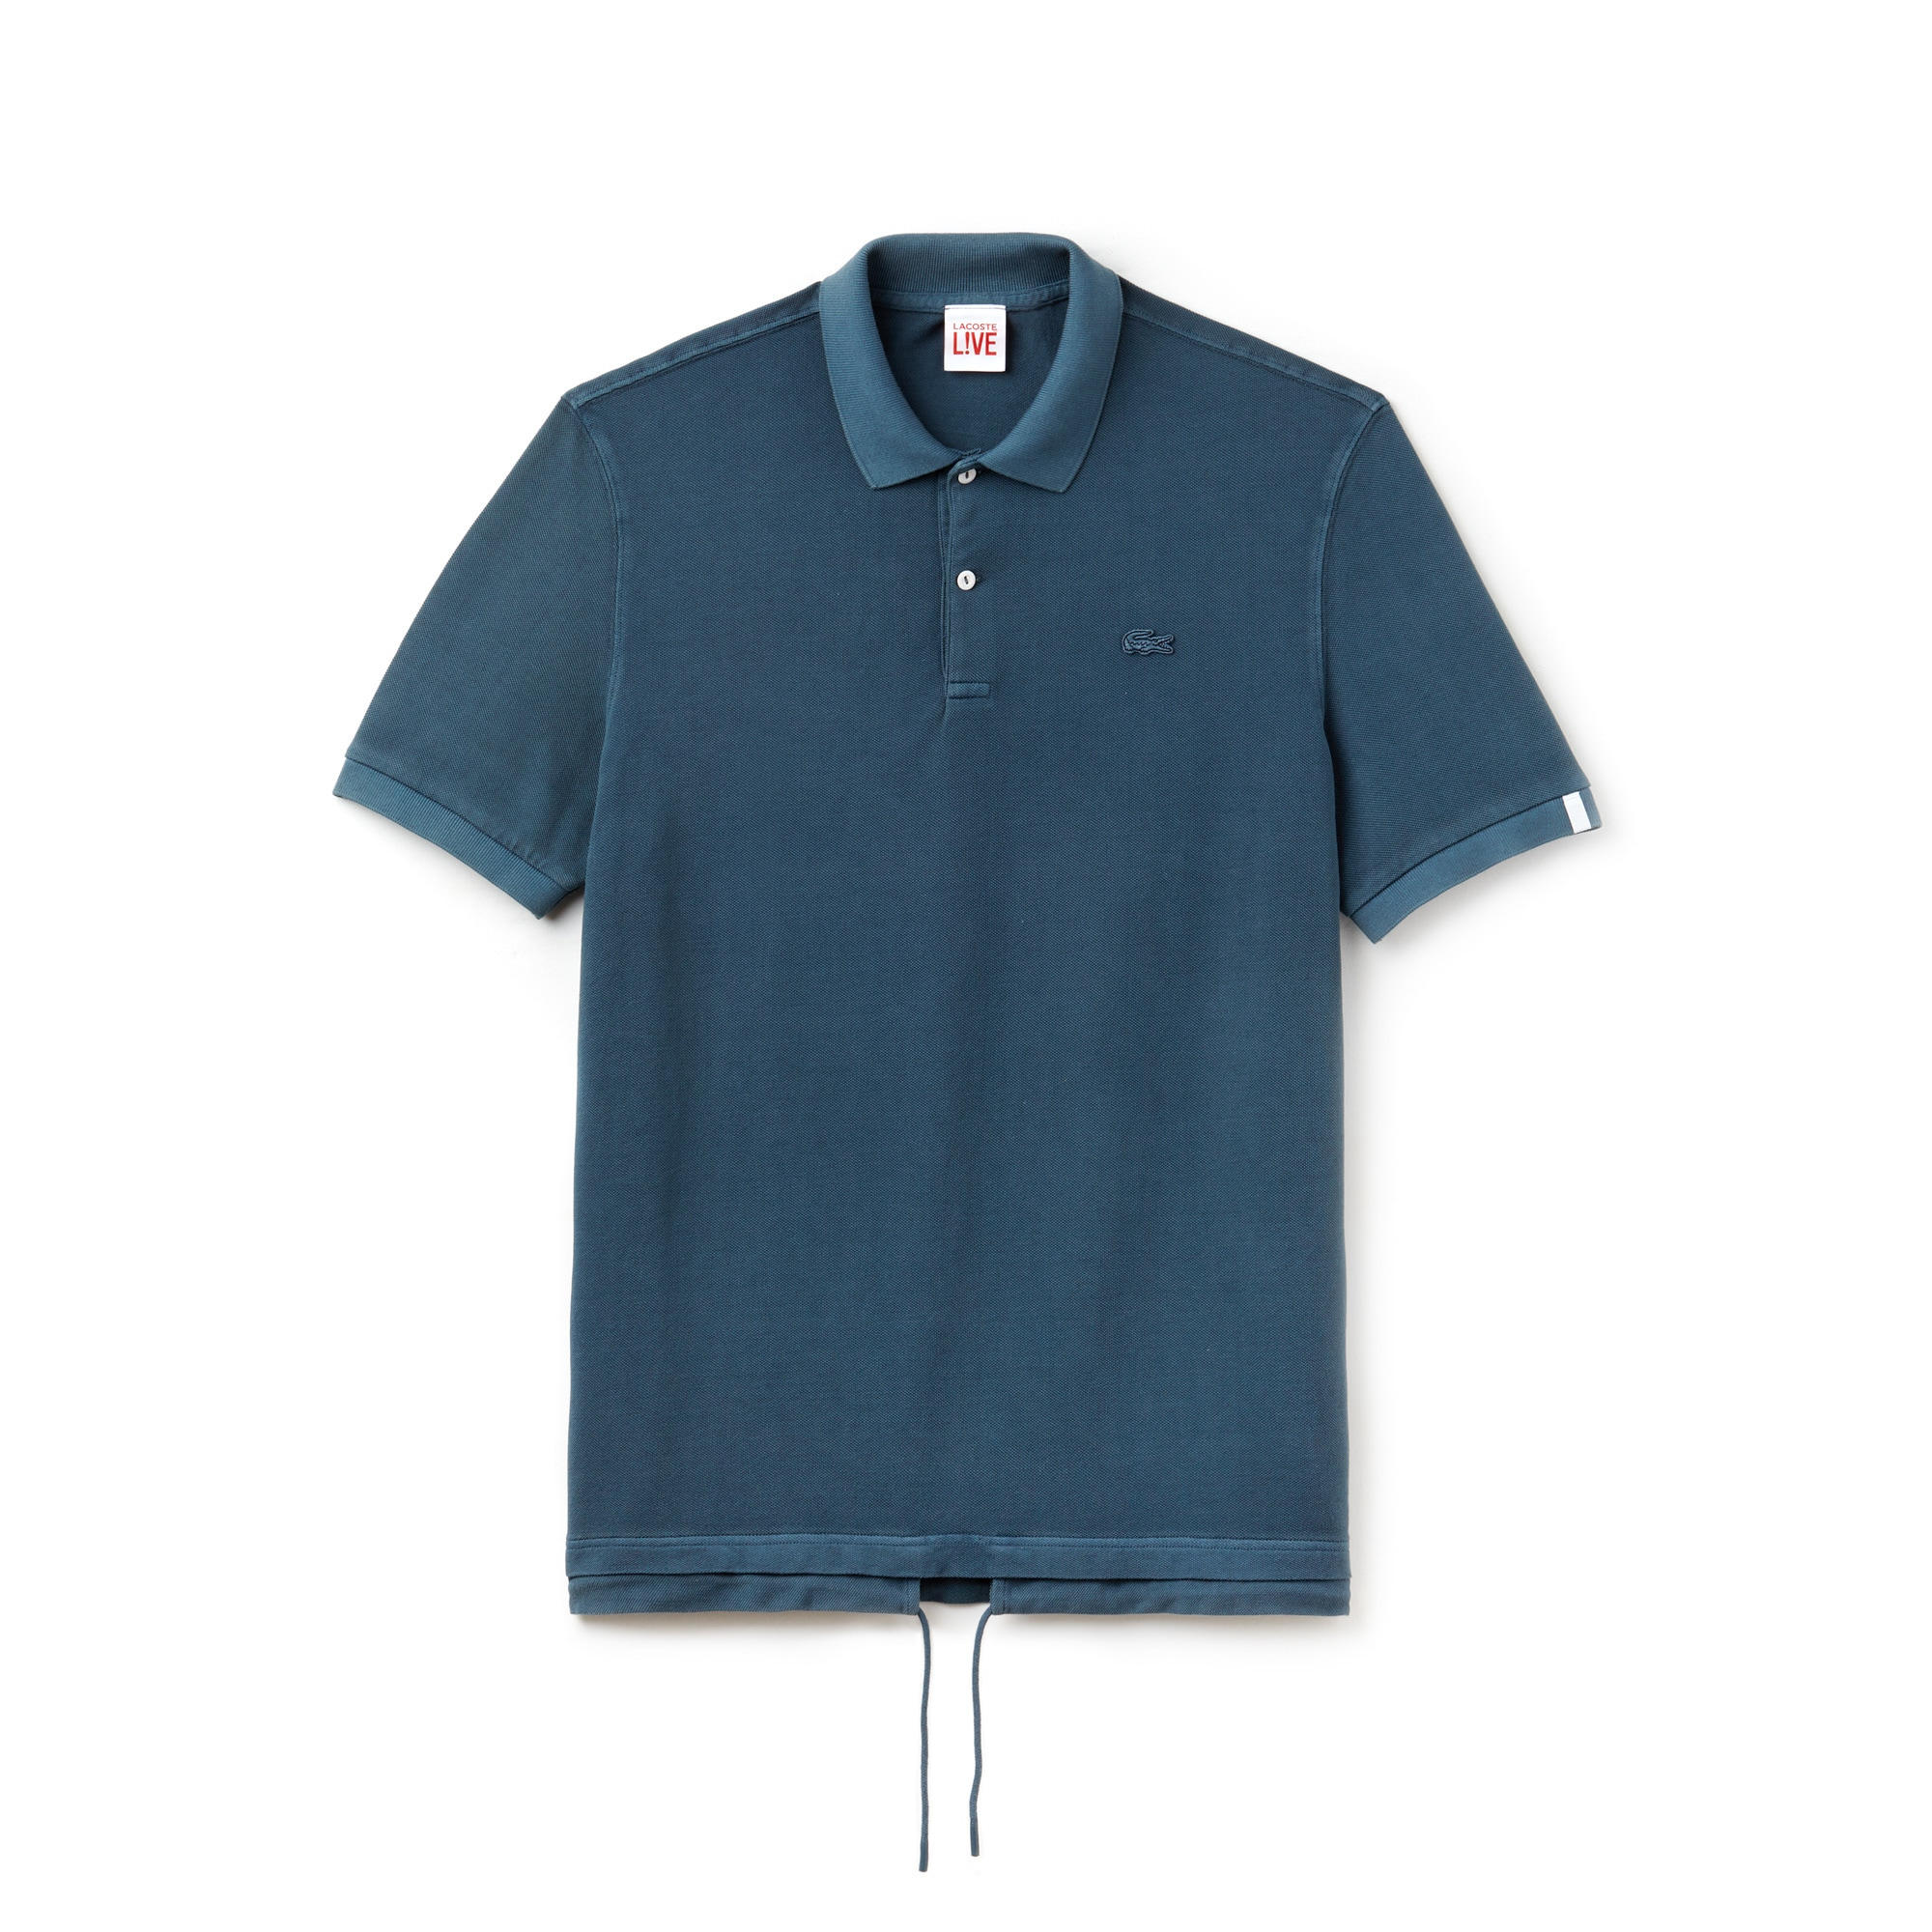 Men's Lacoste LIVE Drawstring Faded Petit Piqué Polo Shirt